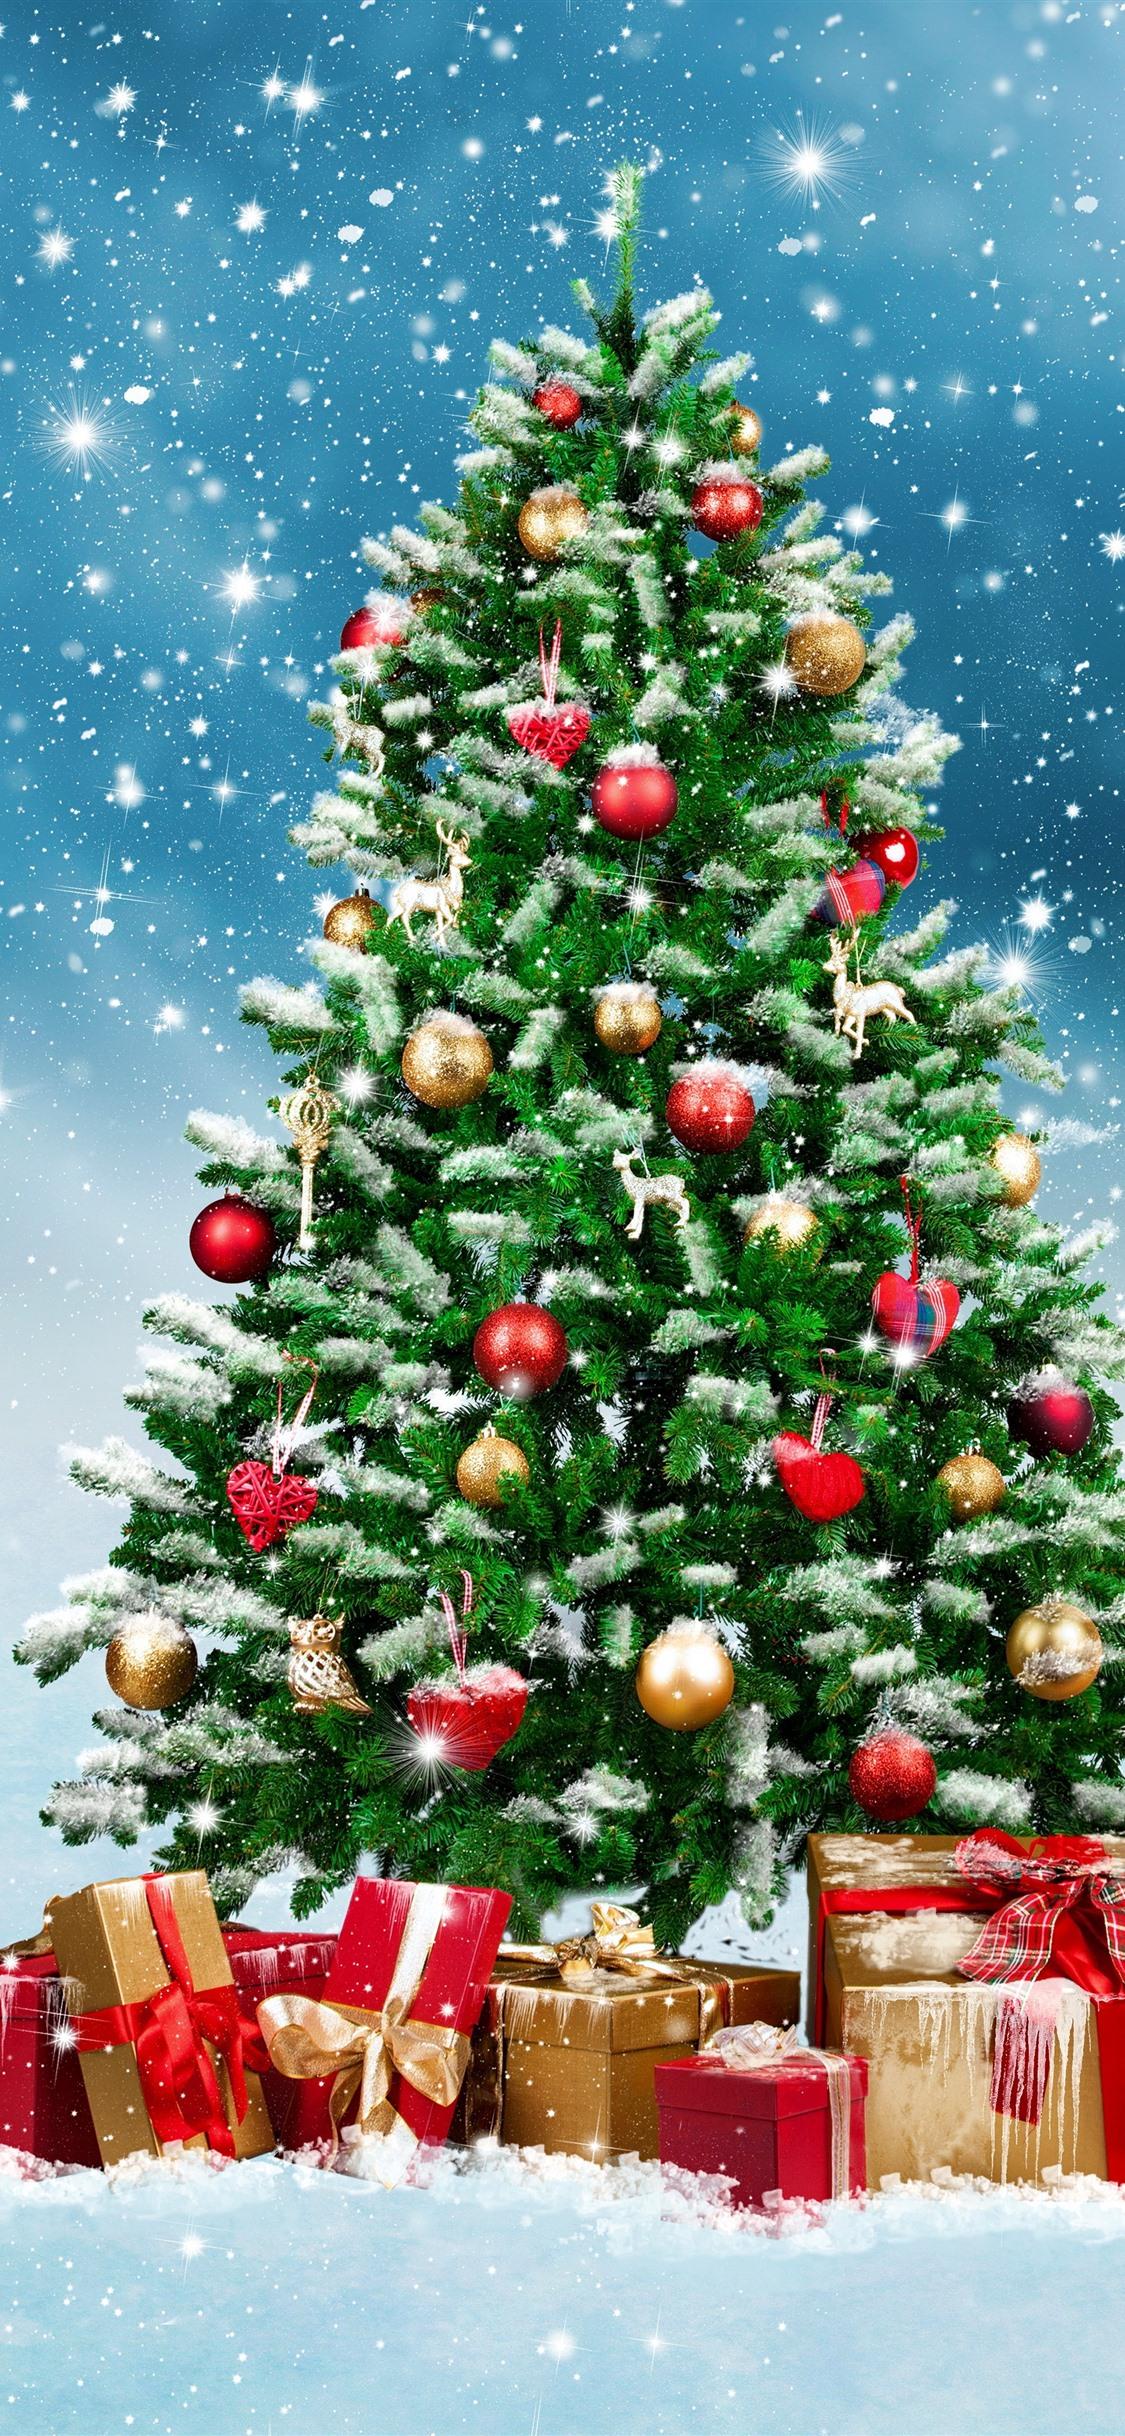 Christmas Tree Gifts Balls Snowflakes Snow Shine